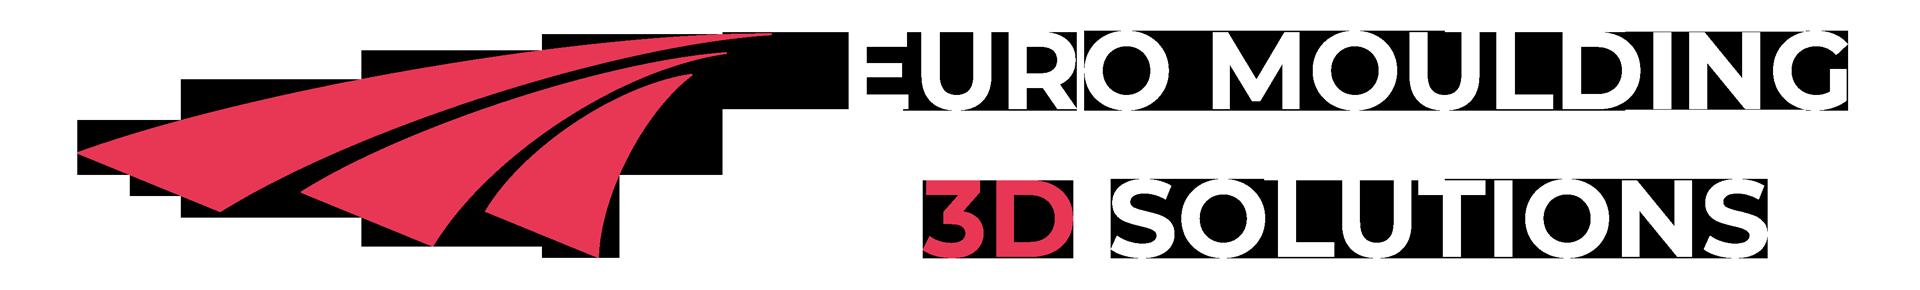 Euro Moulding 3D Solutions